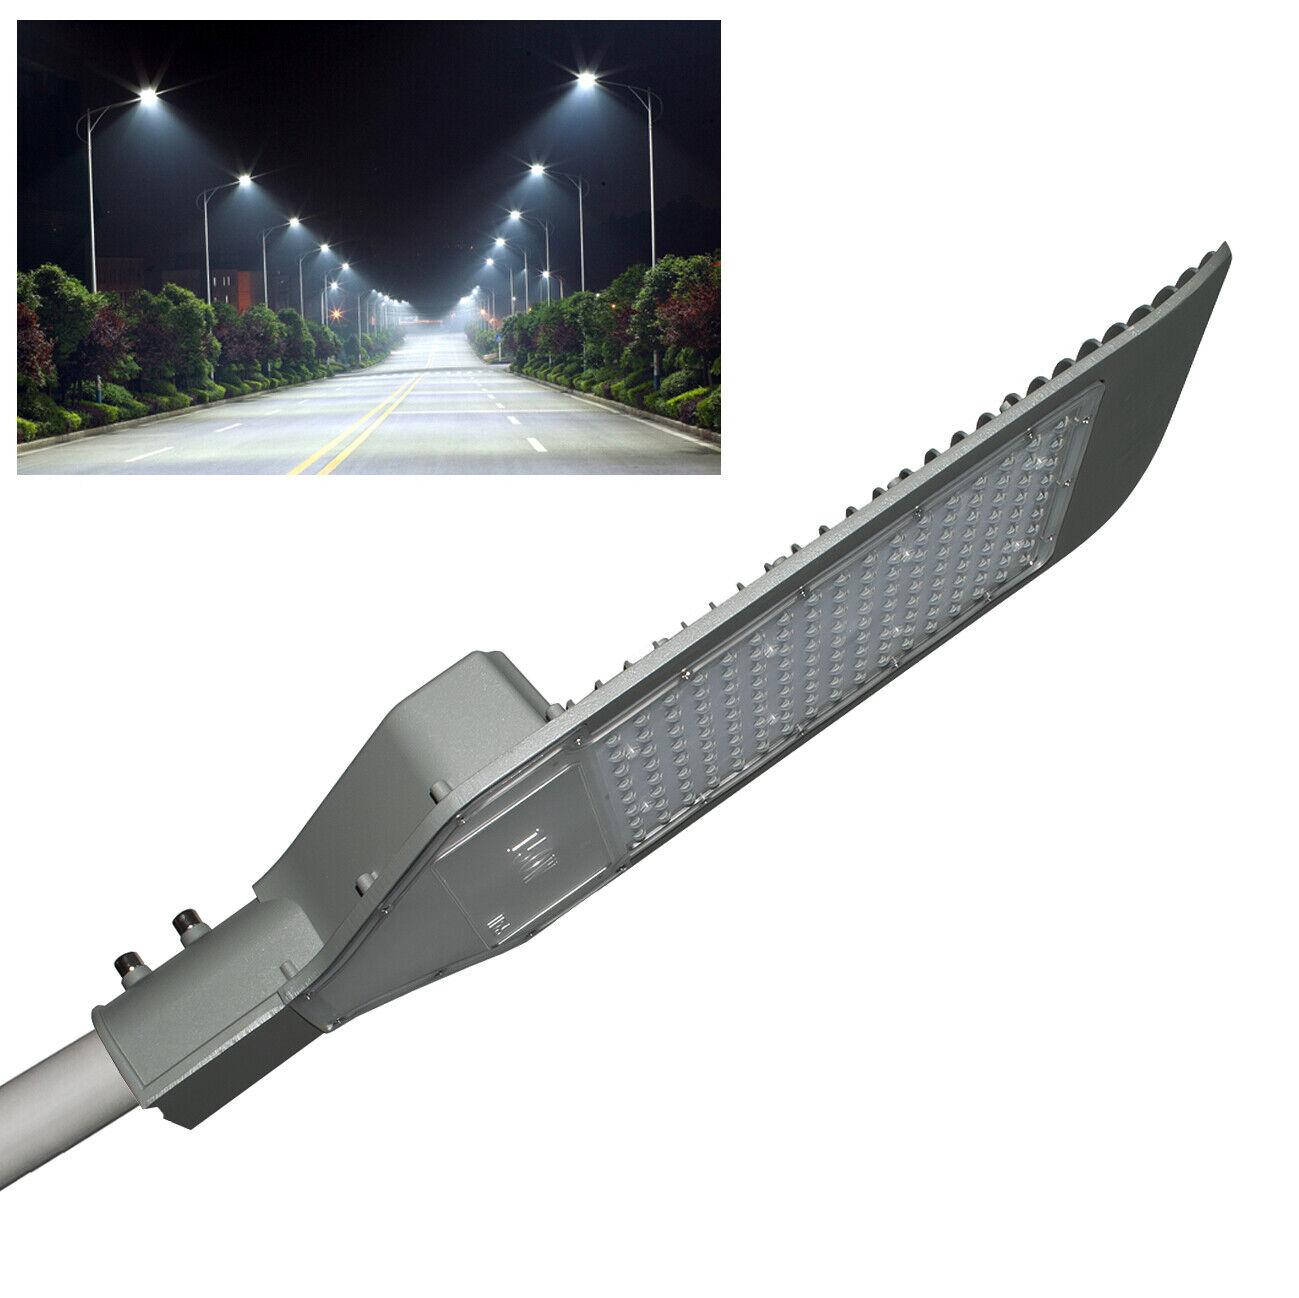 Faro stradale armatura palo lampione LED 150W 16500lm resa 1650w esterno IP65